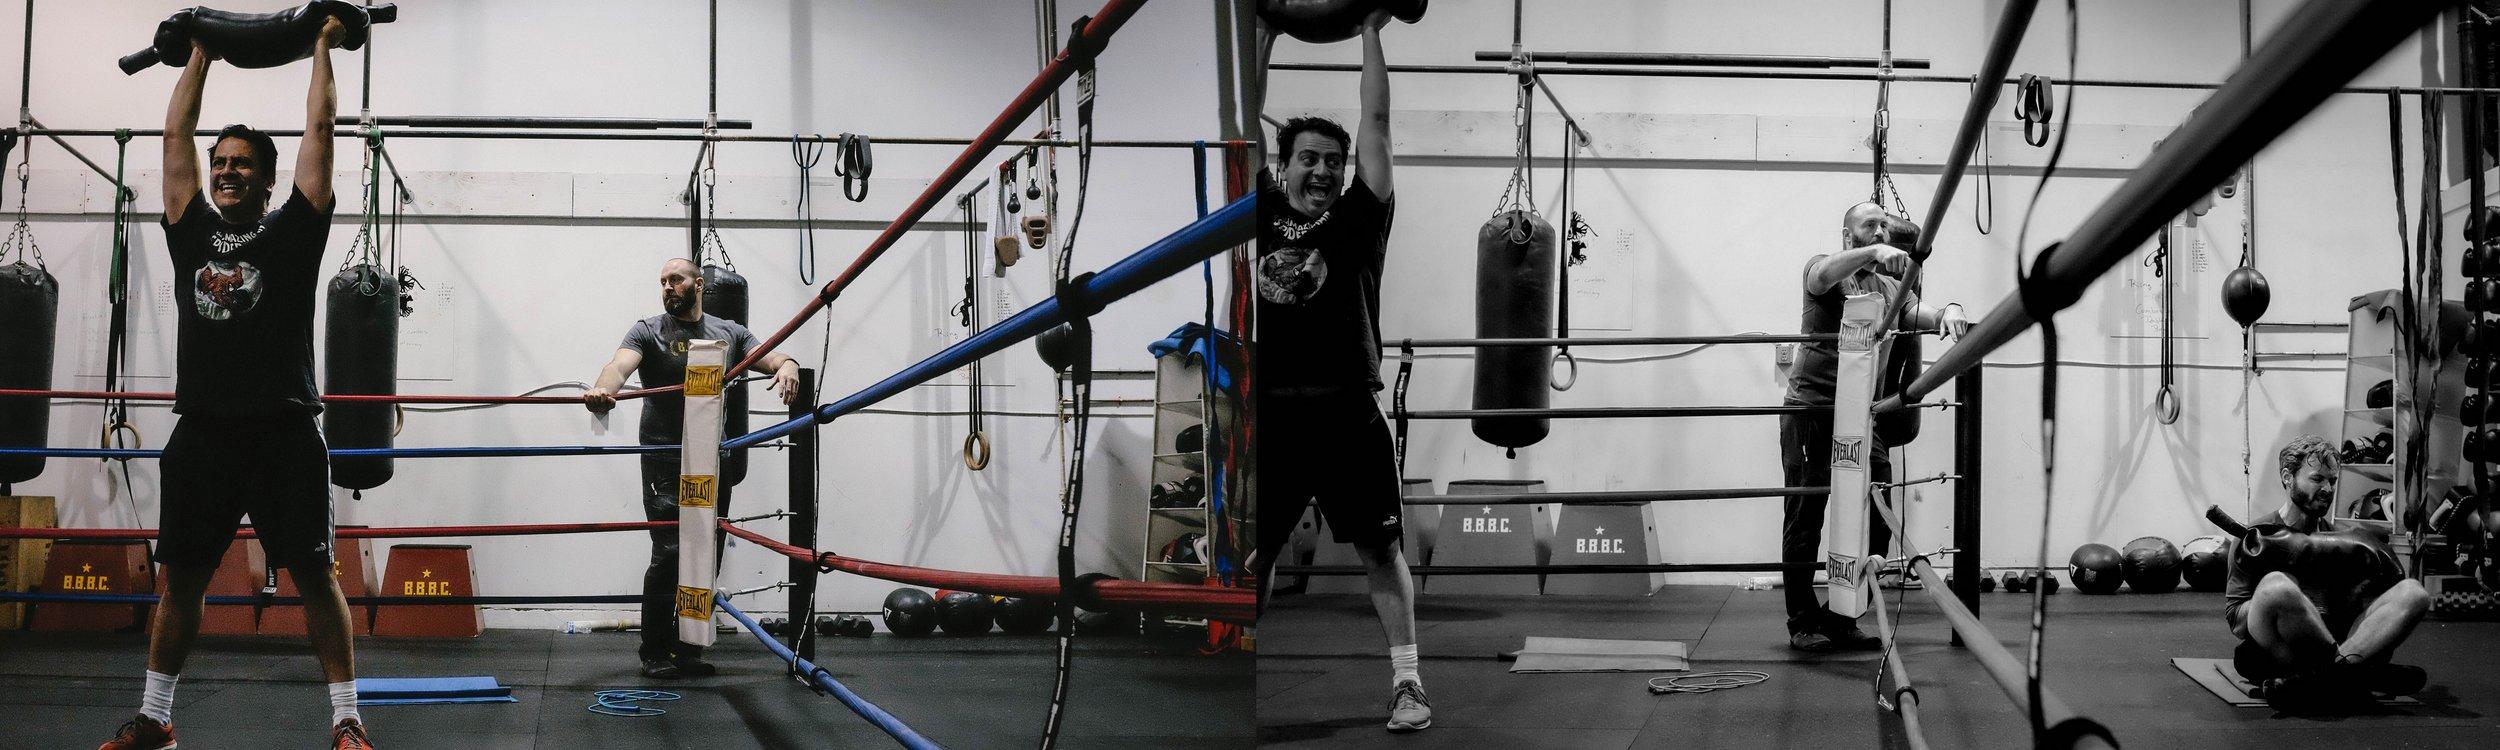 Ballard Boxing4.jpg